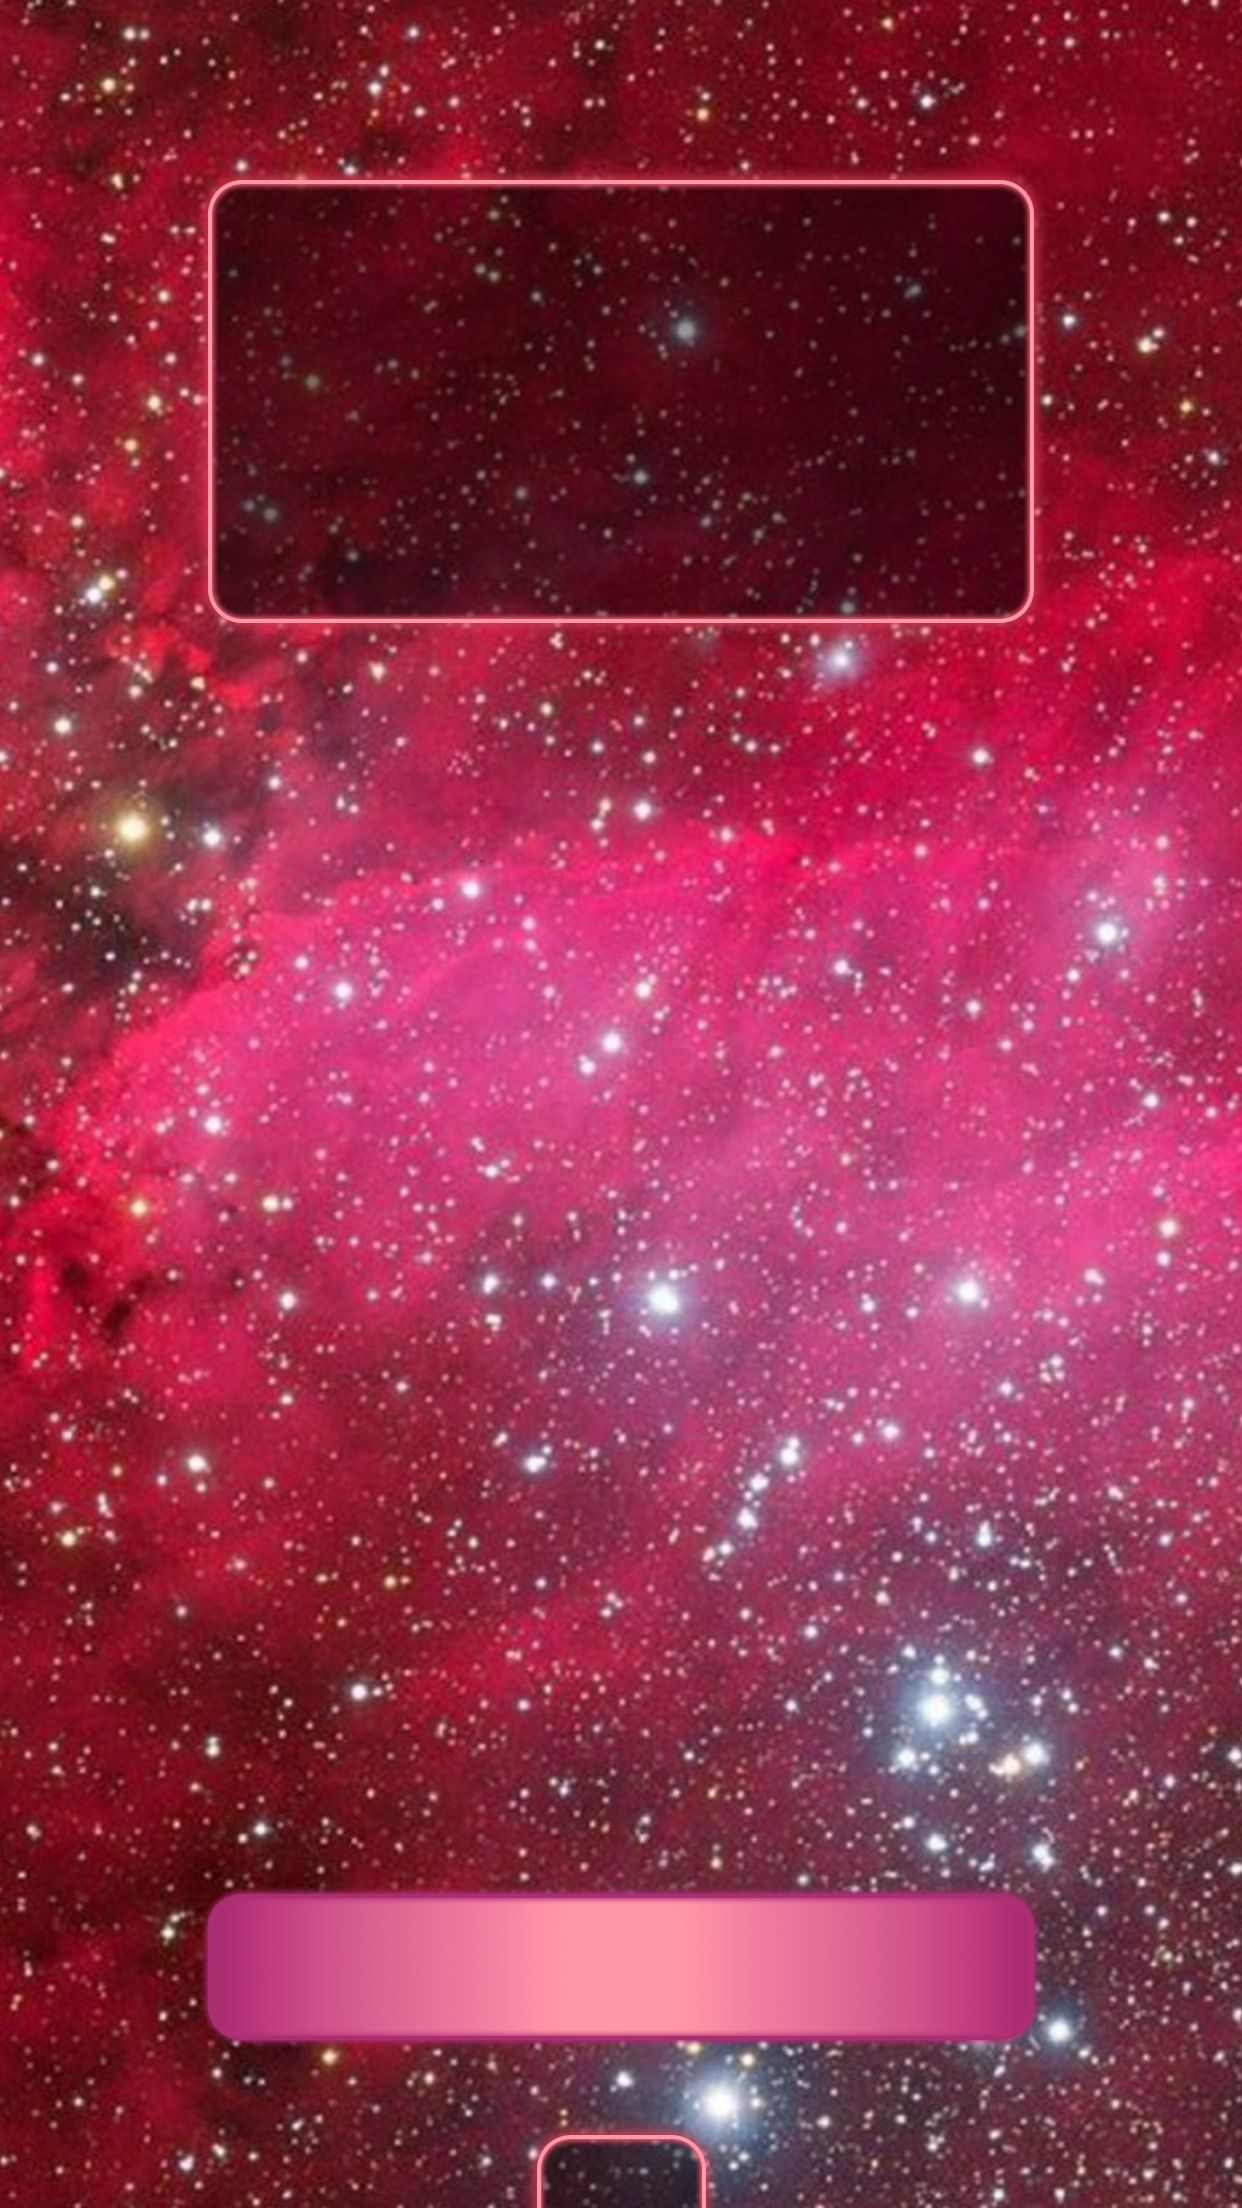 Tap And Get The Free App Lockscreens Art Creative Space Stars